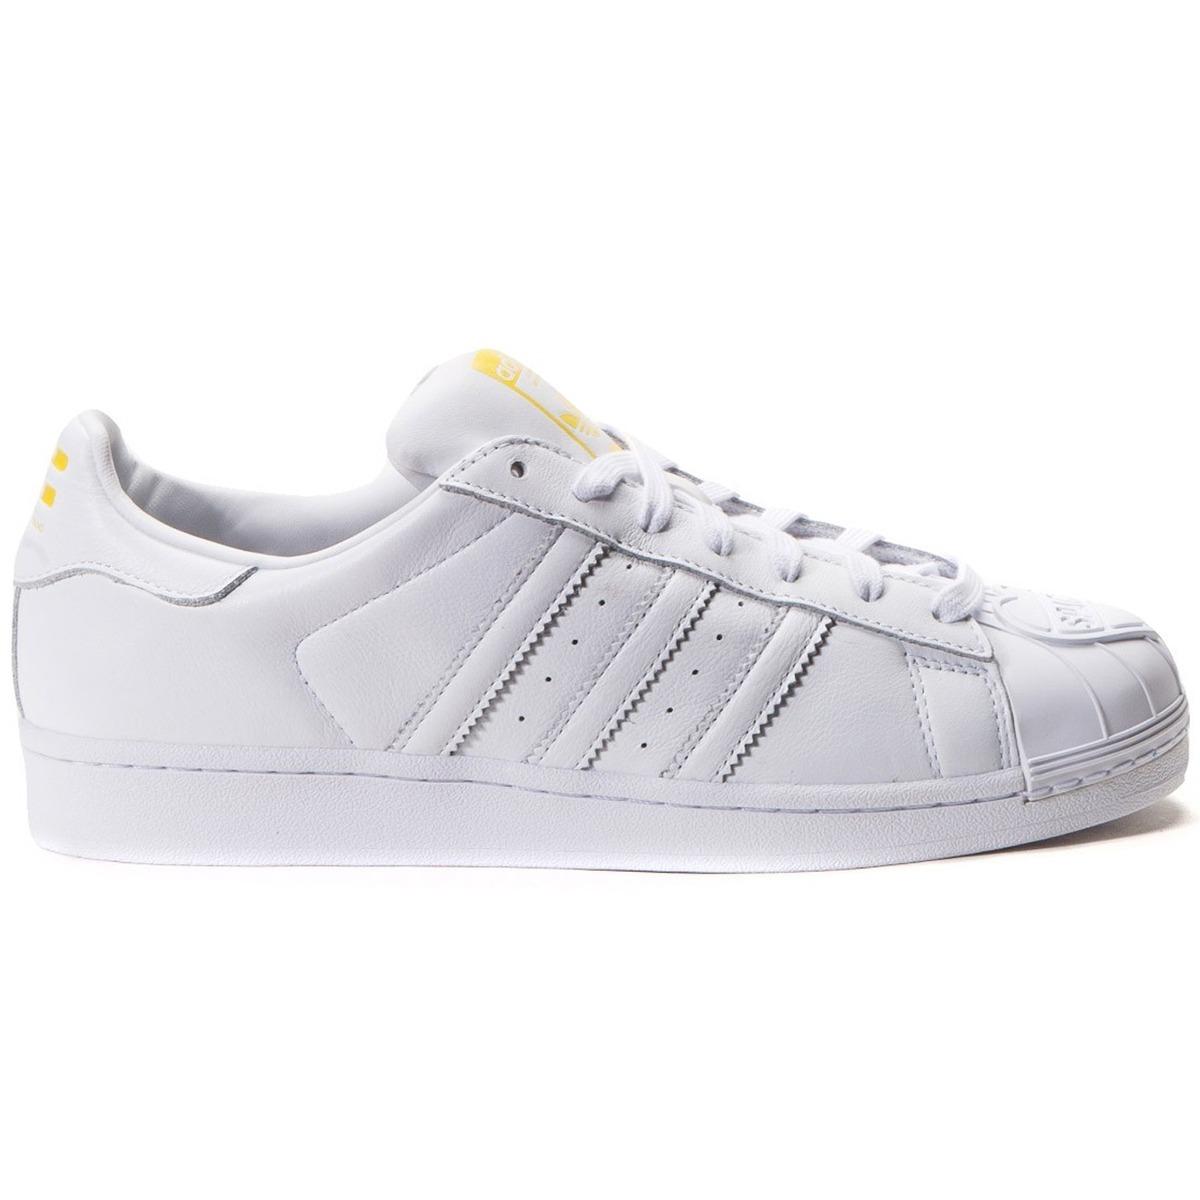 329b1b15b58 tenis-superstar-originals-pharrell-para-hombre-adidas -s83348-D NQ NP 761711-MLM20619392632 032016-F.jpg